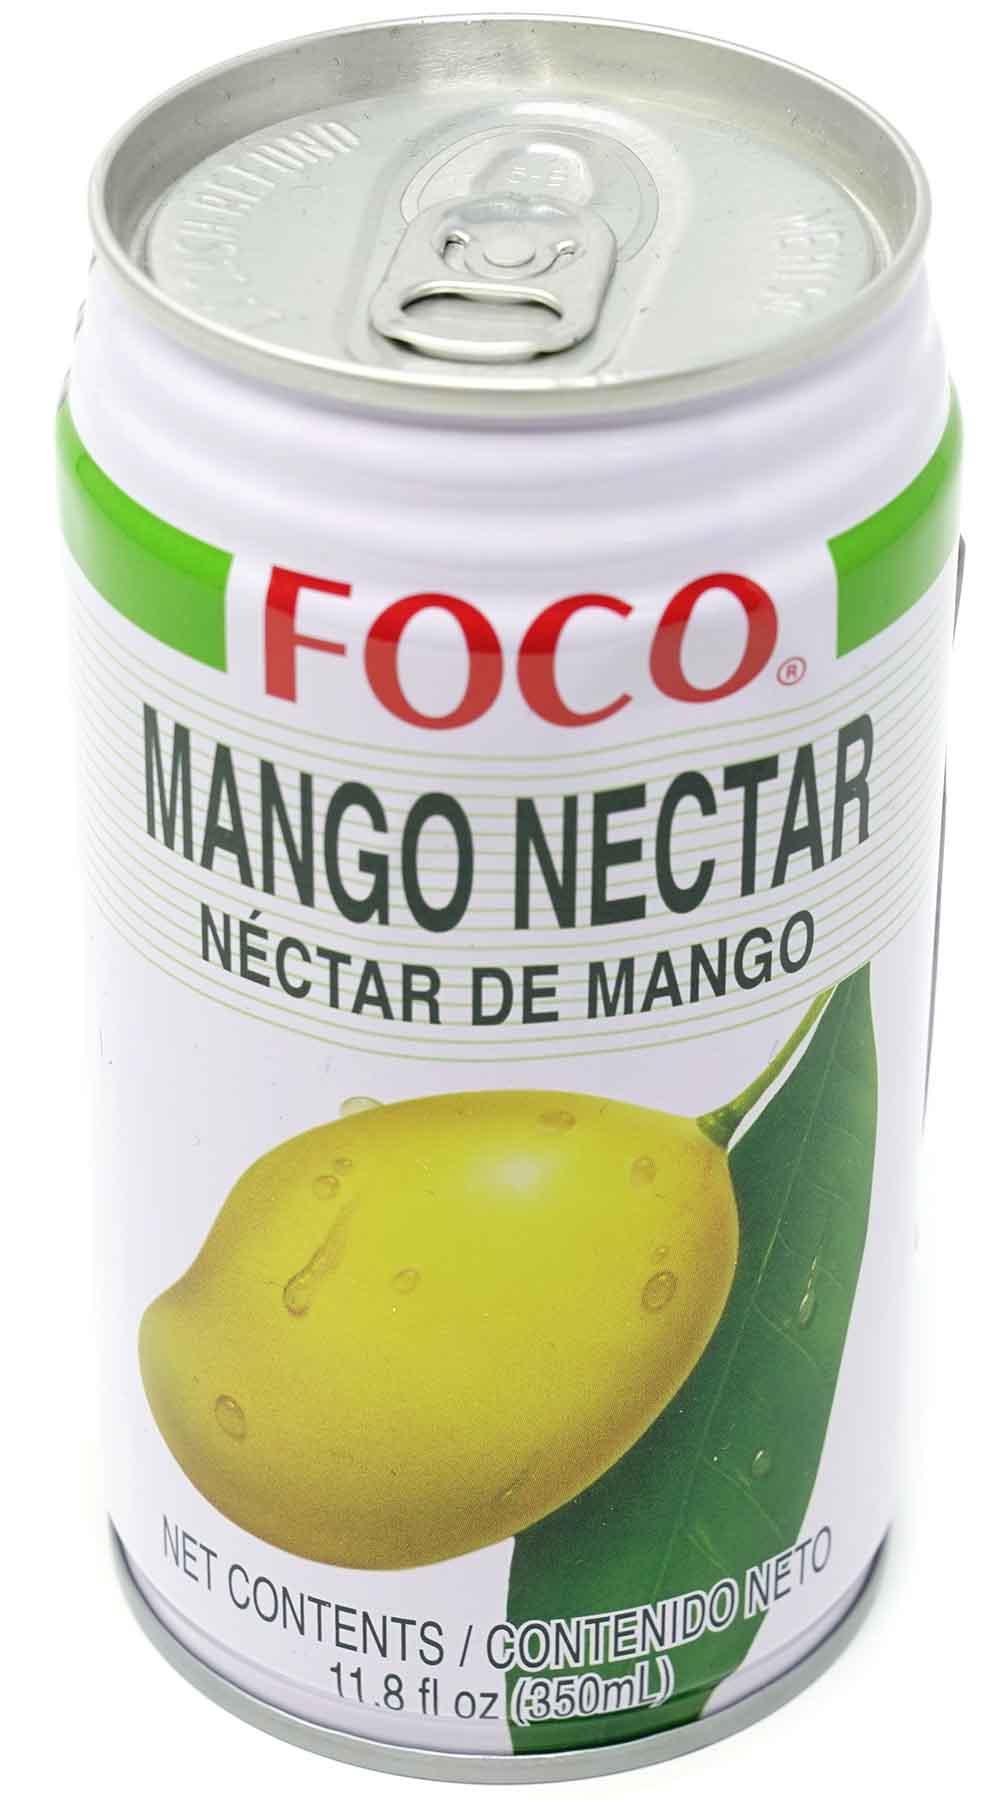 Foco Mangonektar, 350 ml